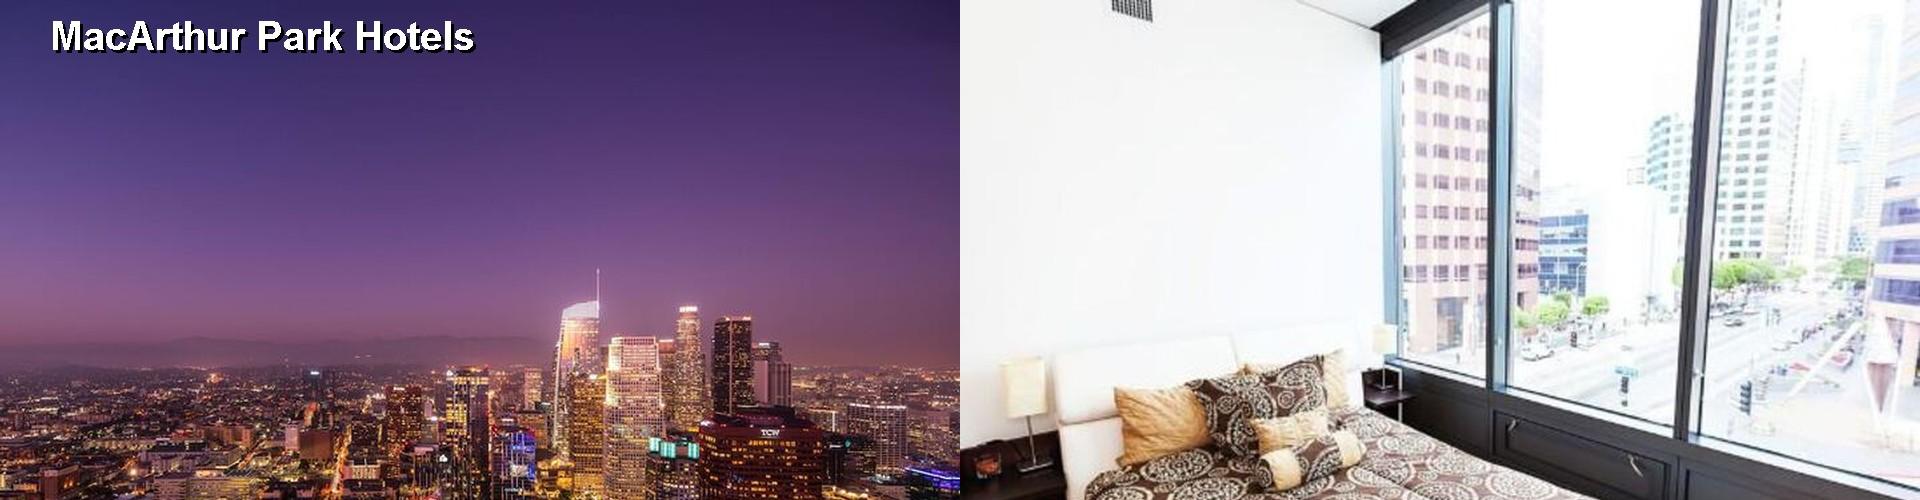 65 Hotels Near Macarthur Park In Los Angeles Ca